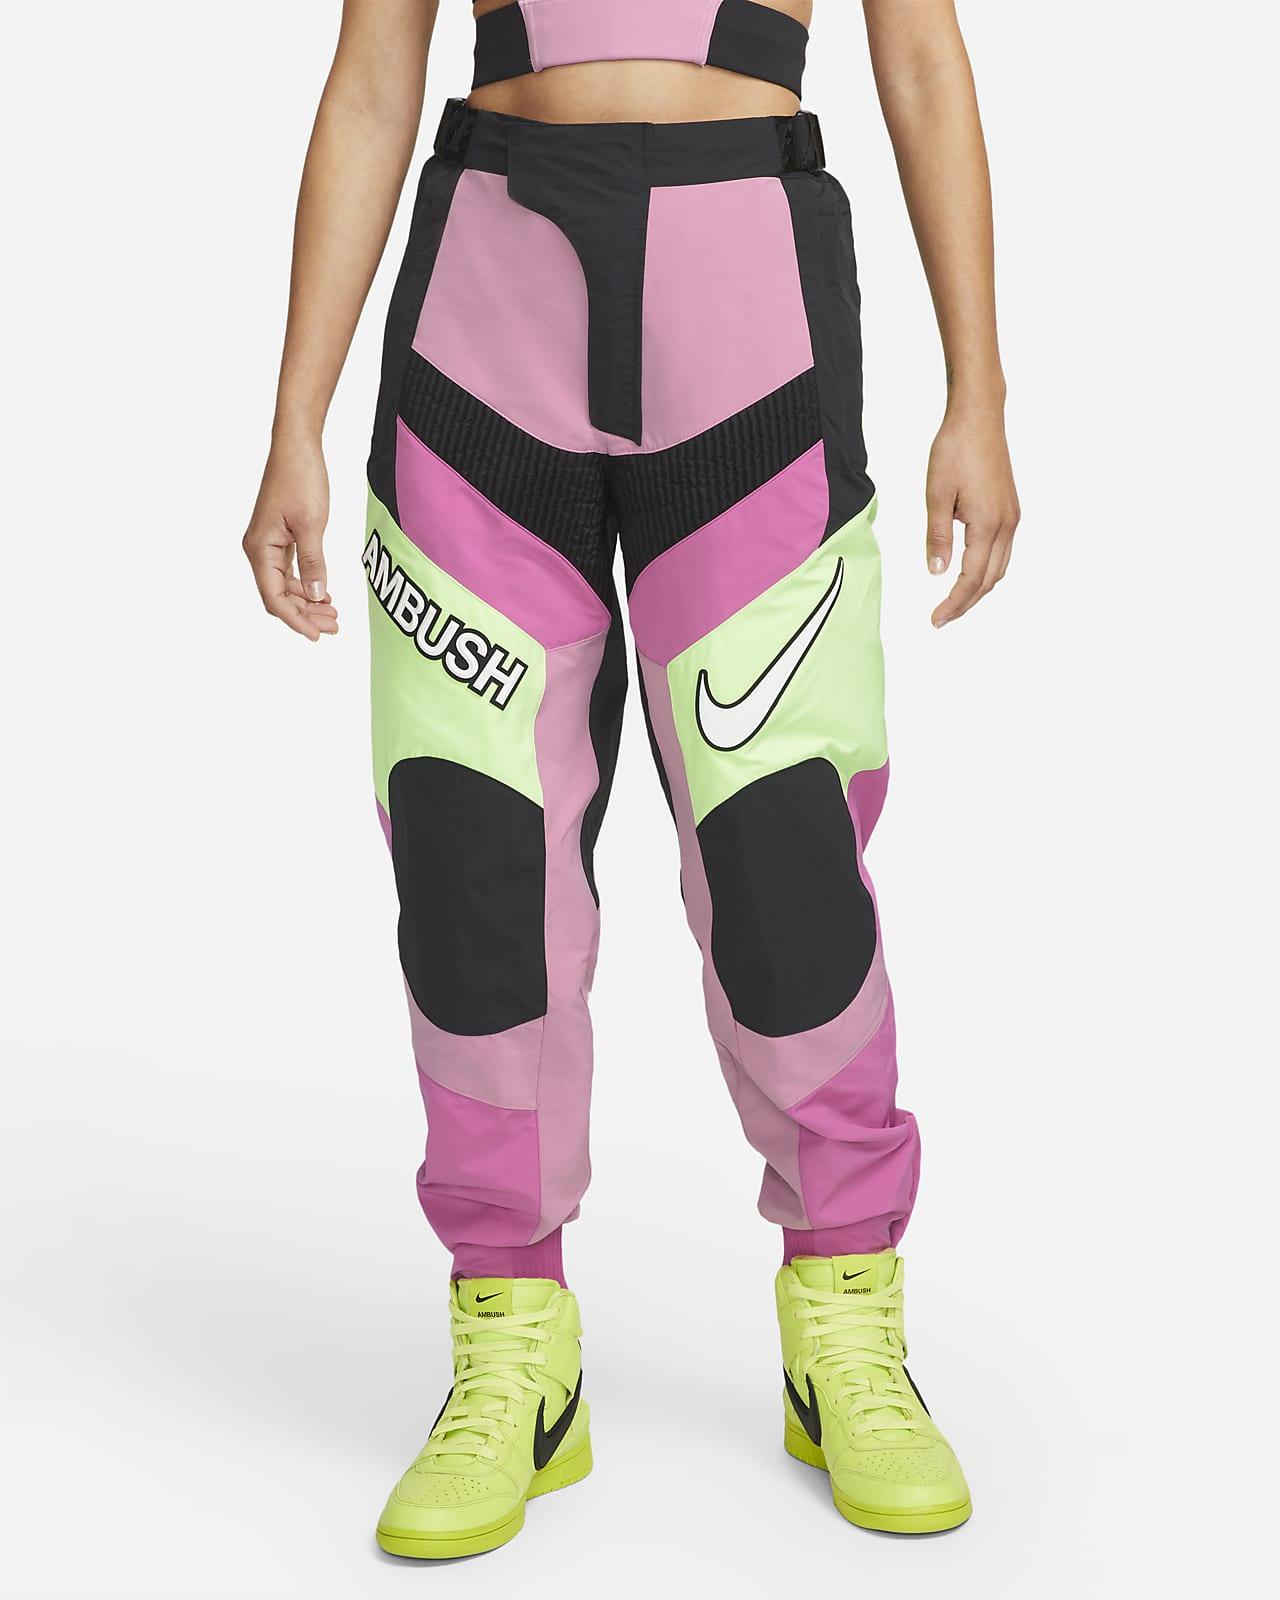 Nike x AMBUSH 摩托車長褲